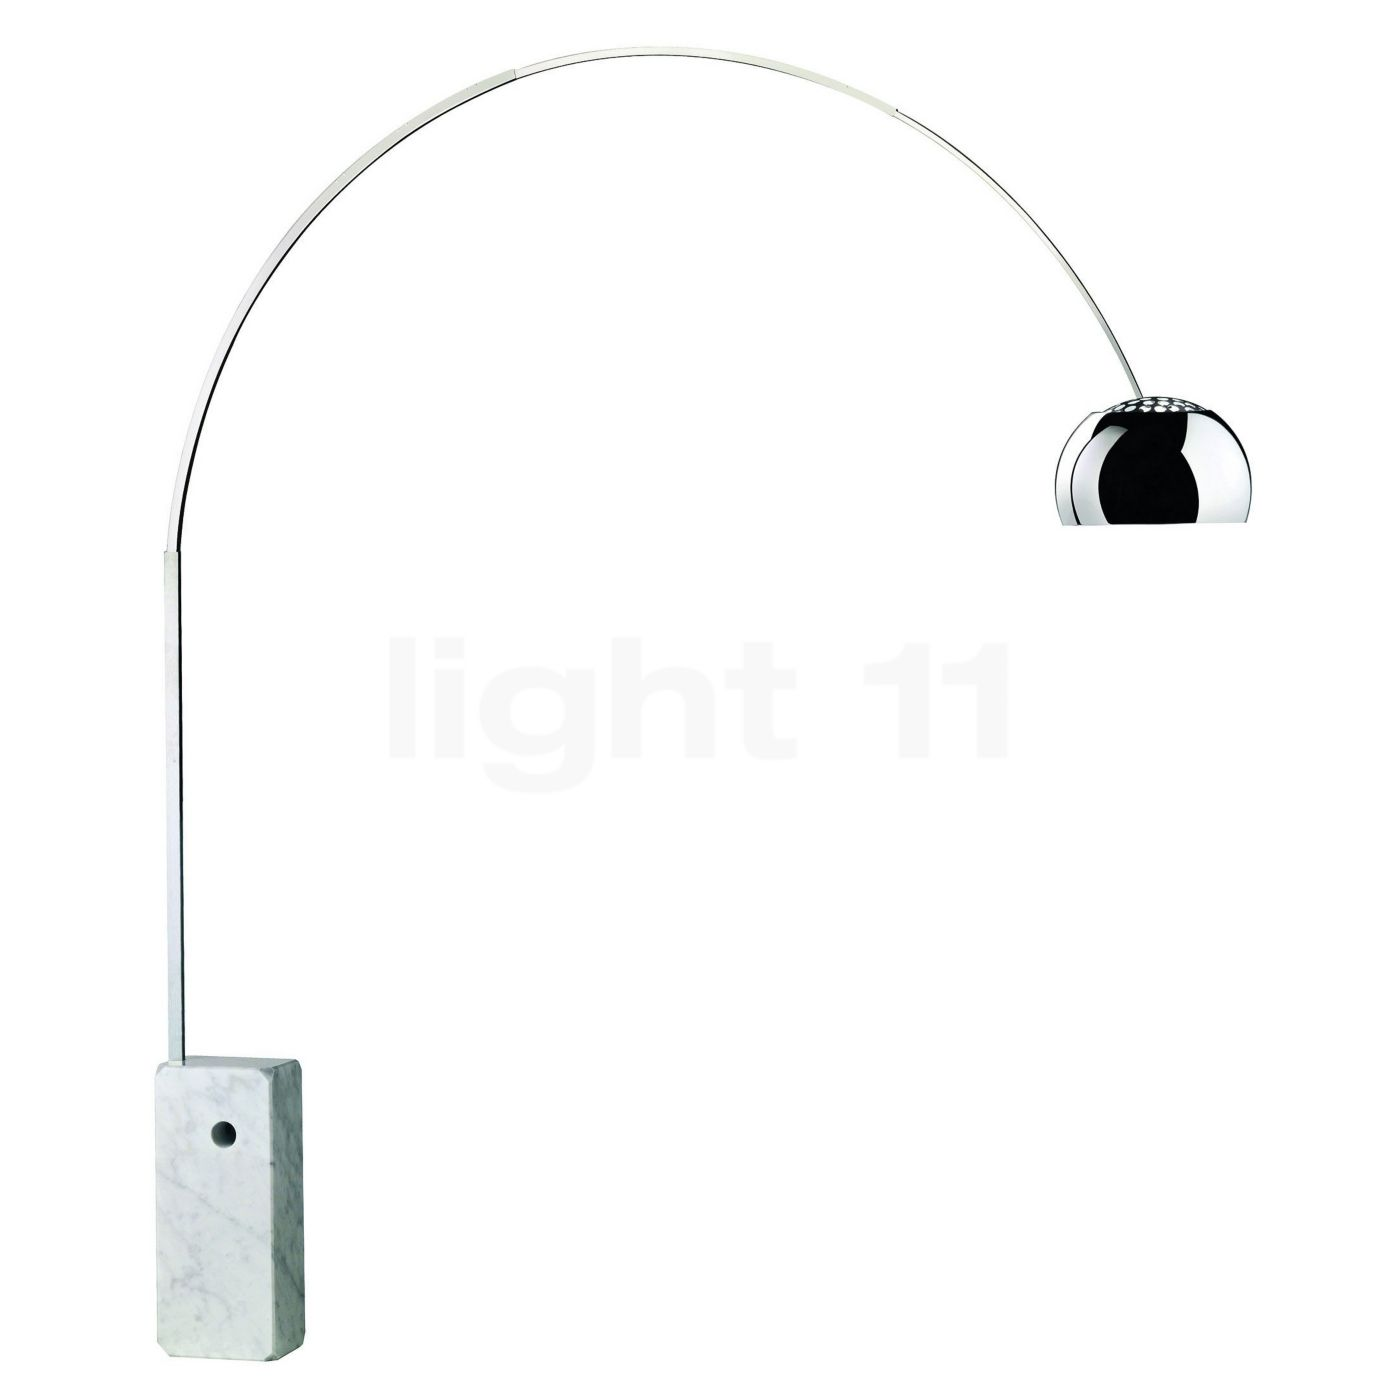 LED-Stehleuchten & LED-Stehlampen Innen kaufen bei light11.de